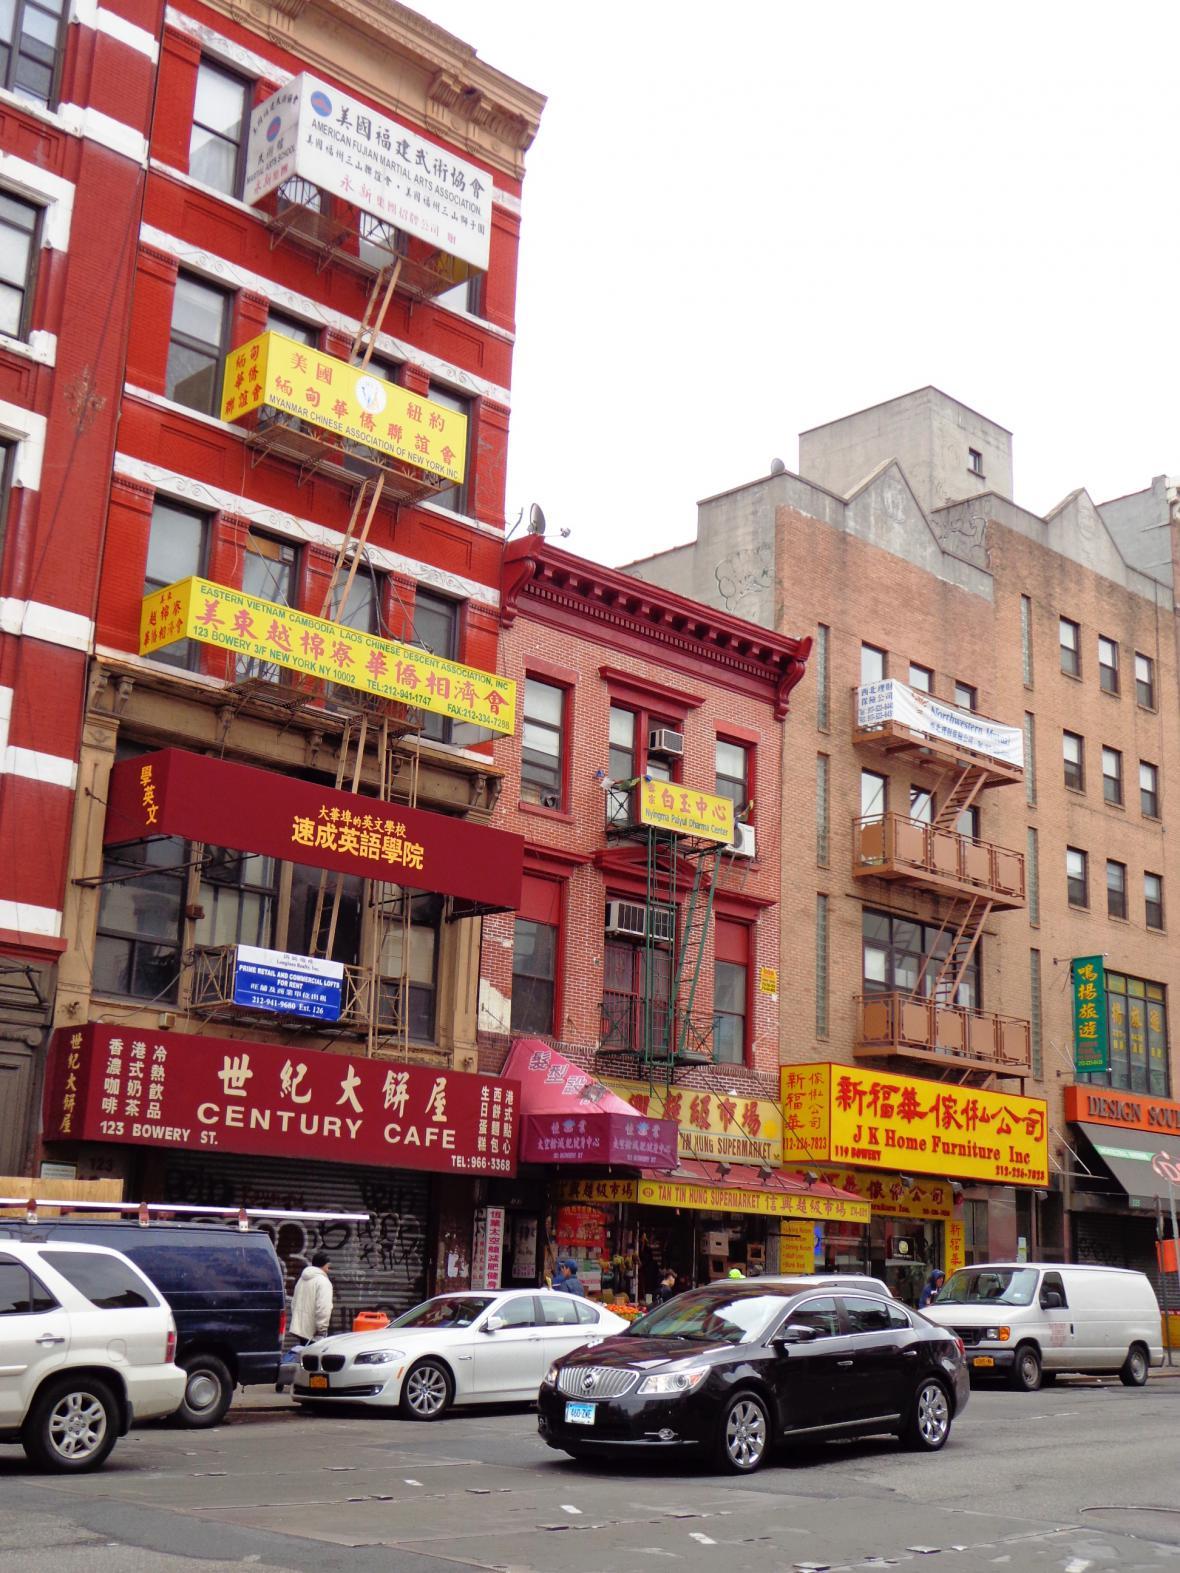 Čínská čtvrť v New Yorku